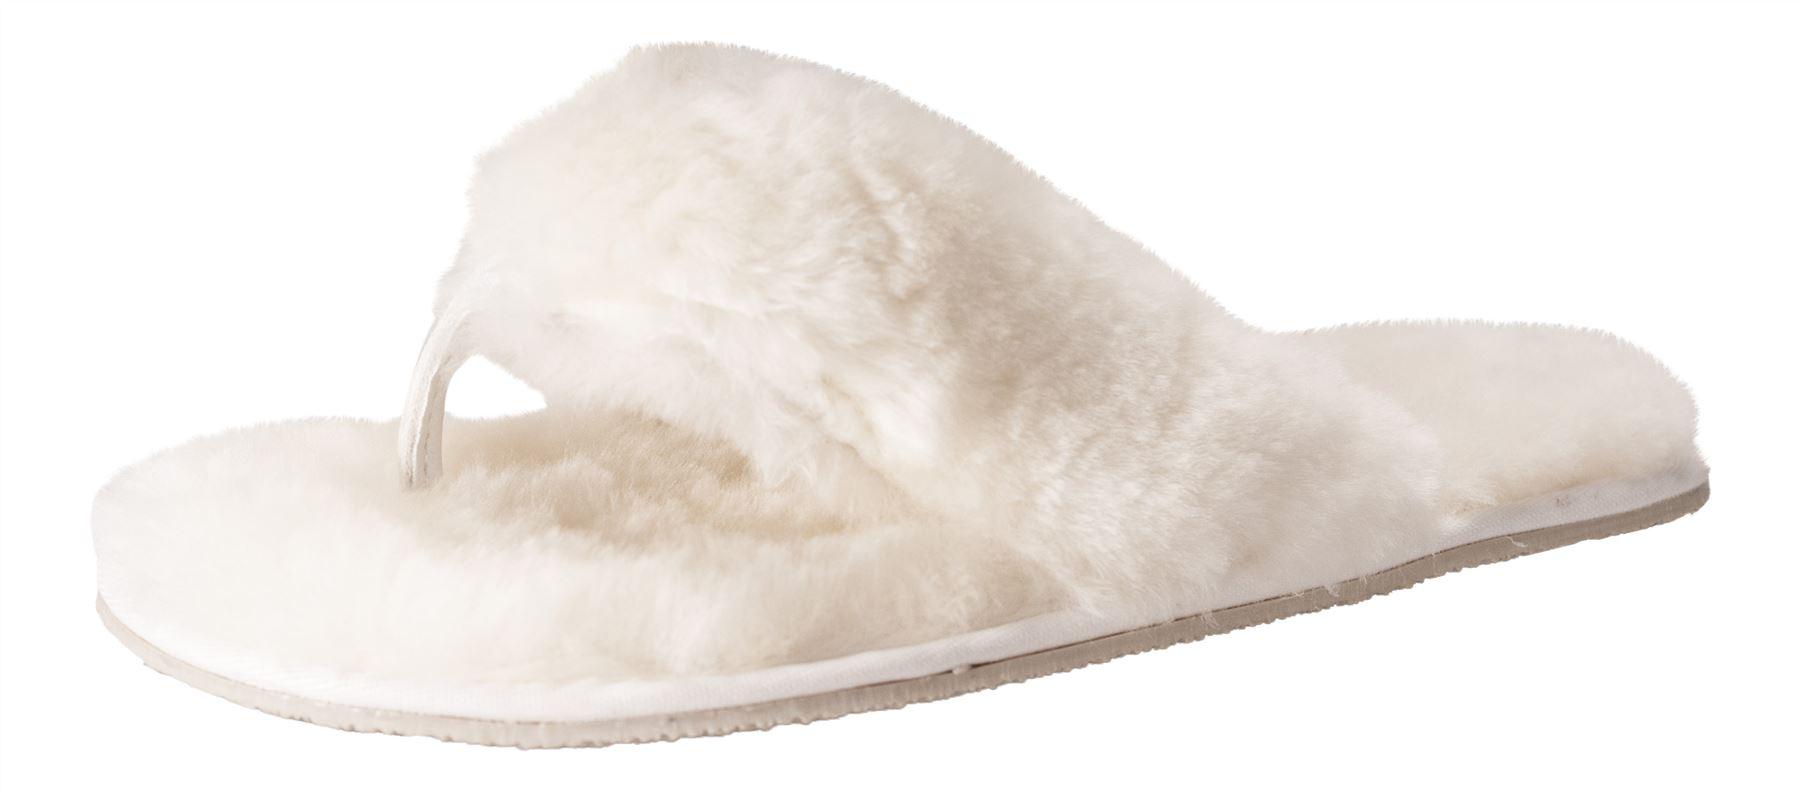 nordvek v ritable peau de mouton dames flip flop pantoufles tongs r el femmes ebay. Black Bedroom Furniture Sets. Home Design Ideas